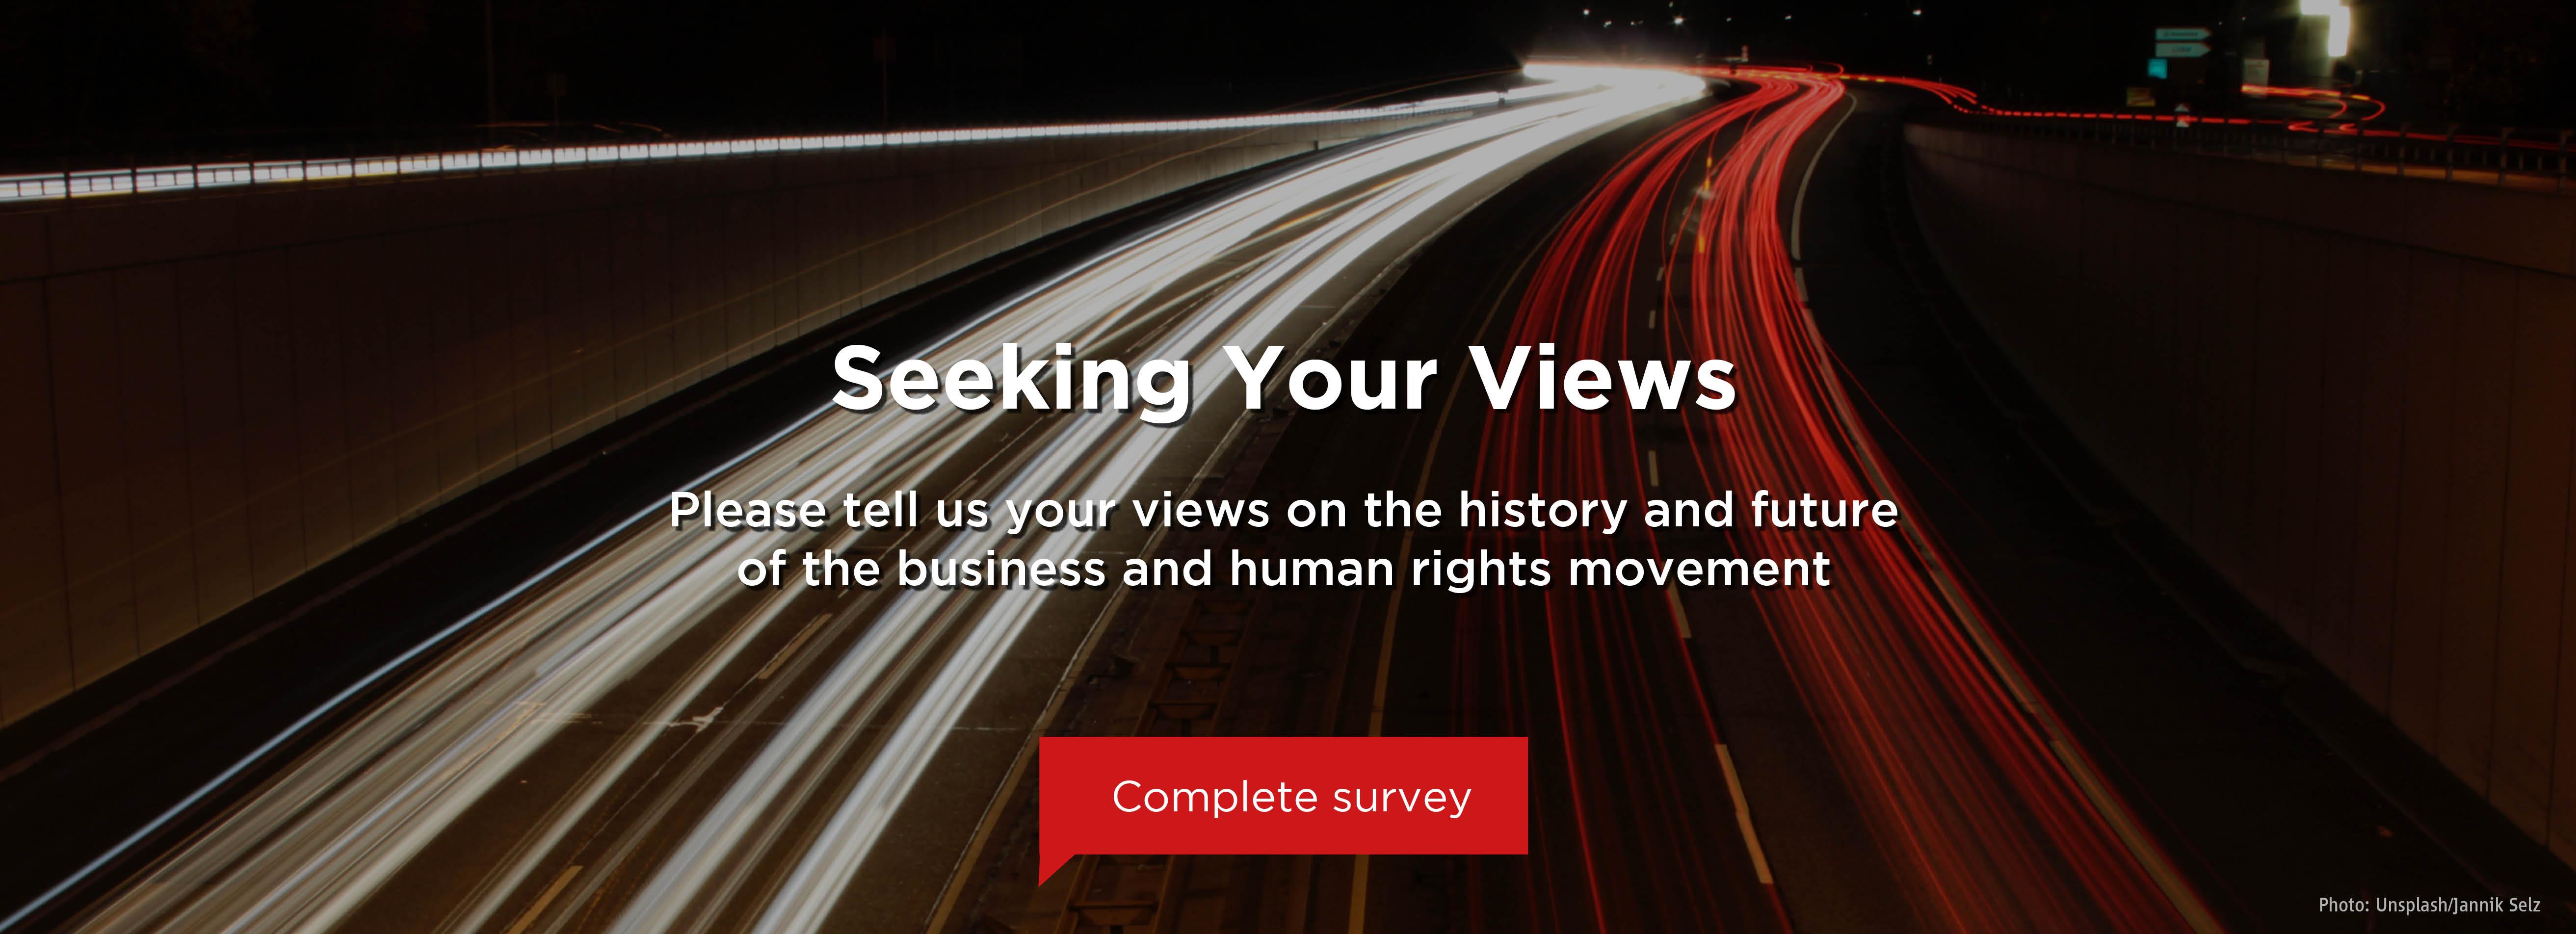 Seeking Views on BHR Movement